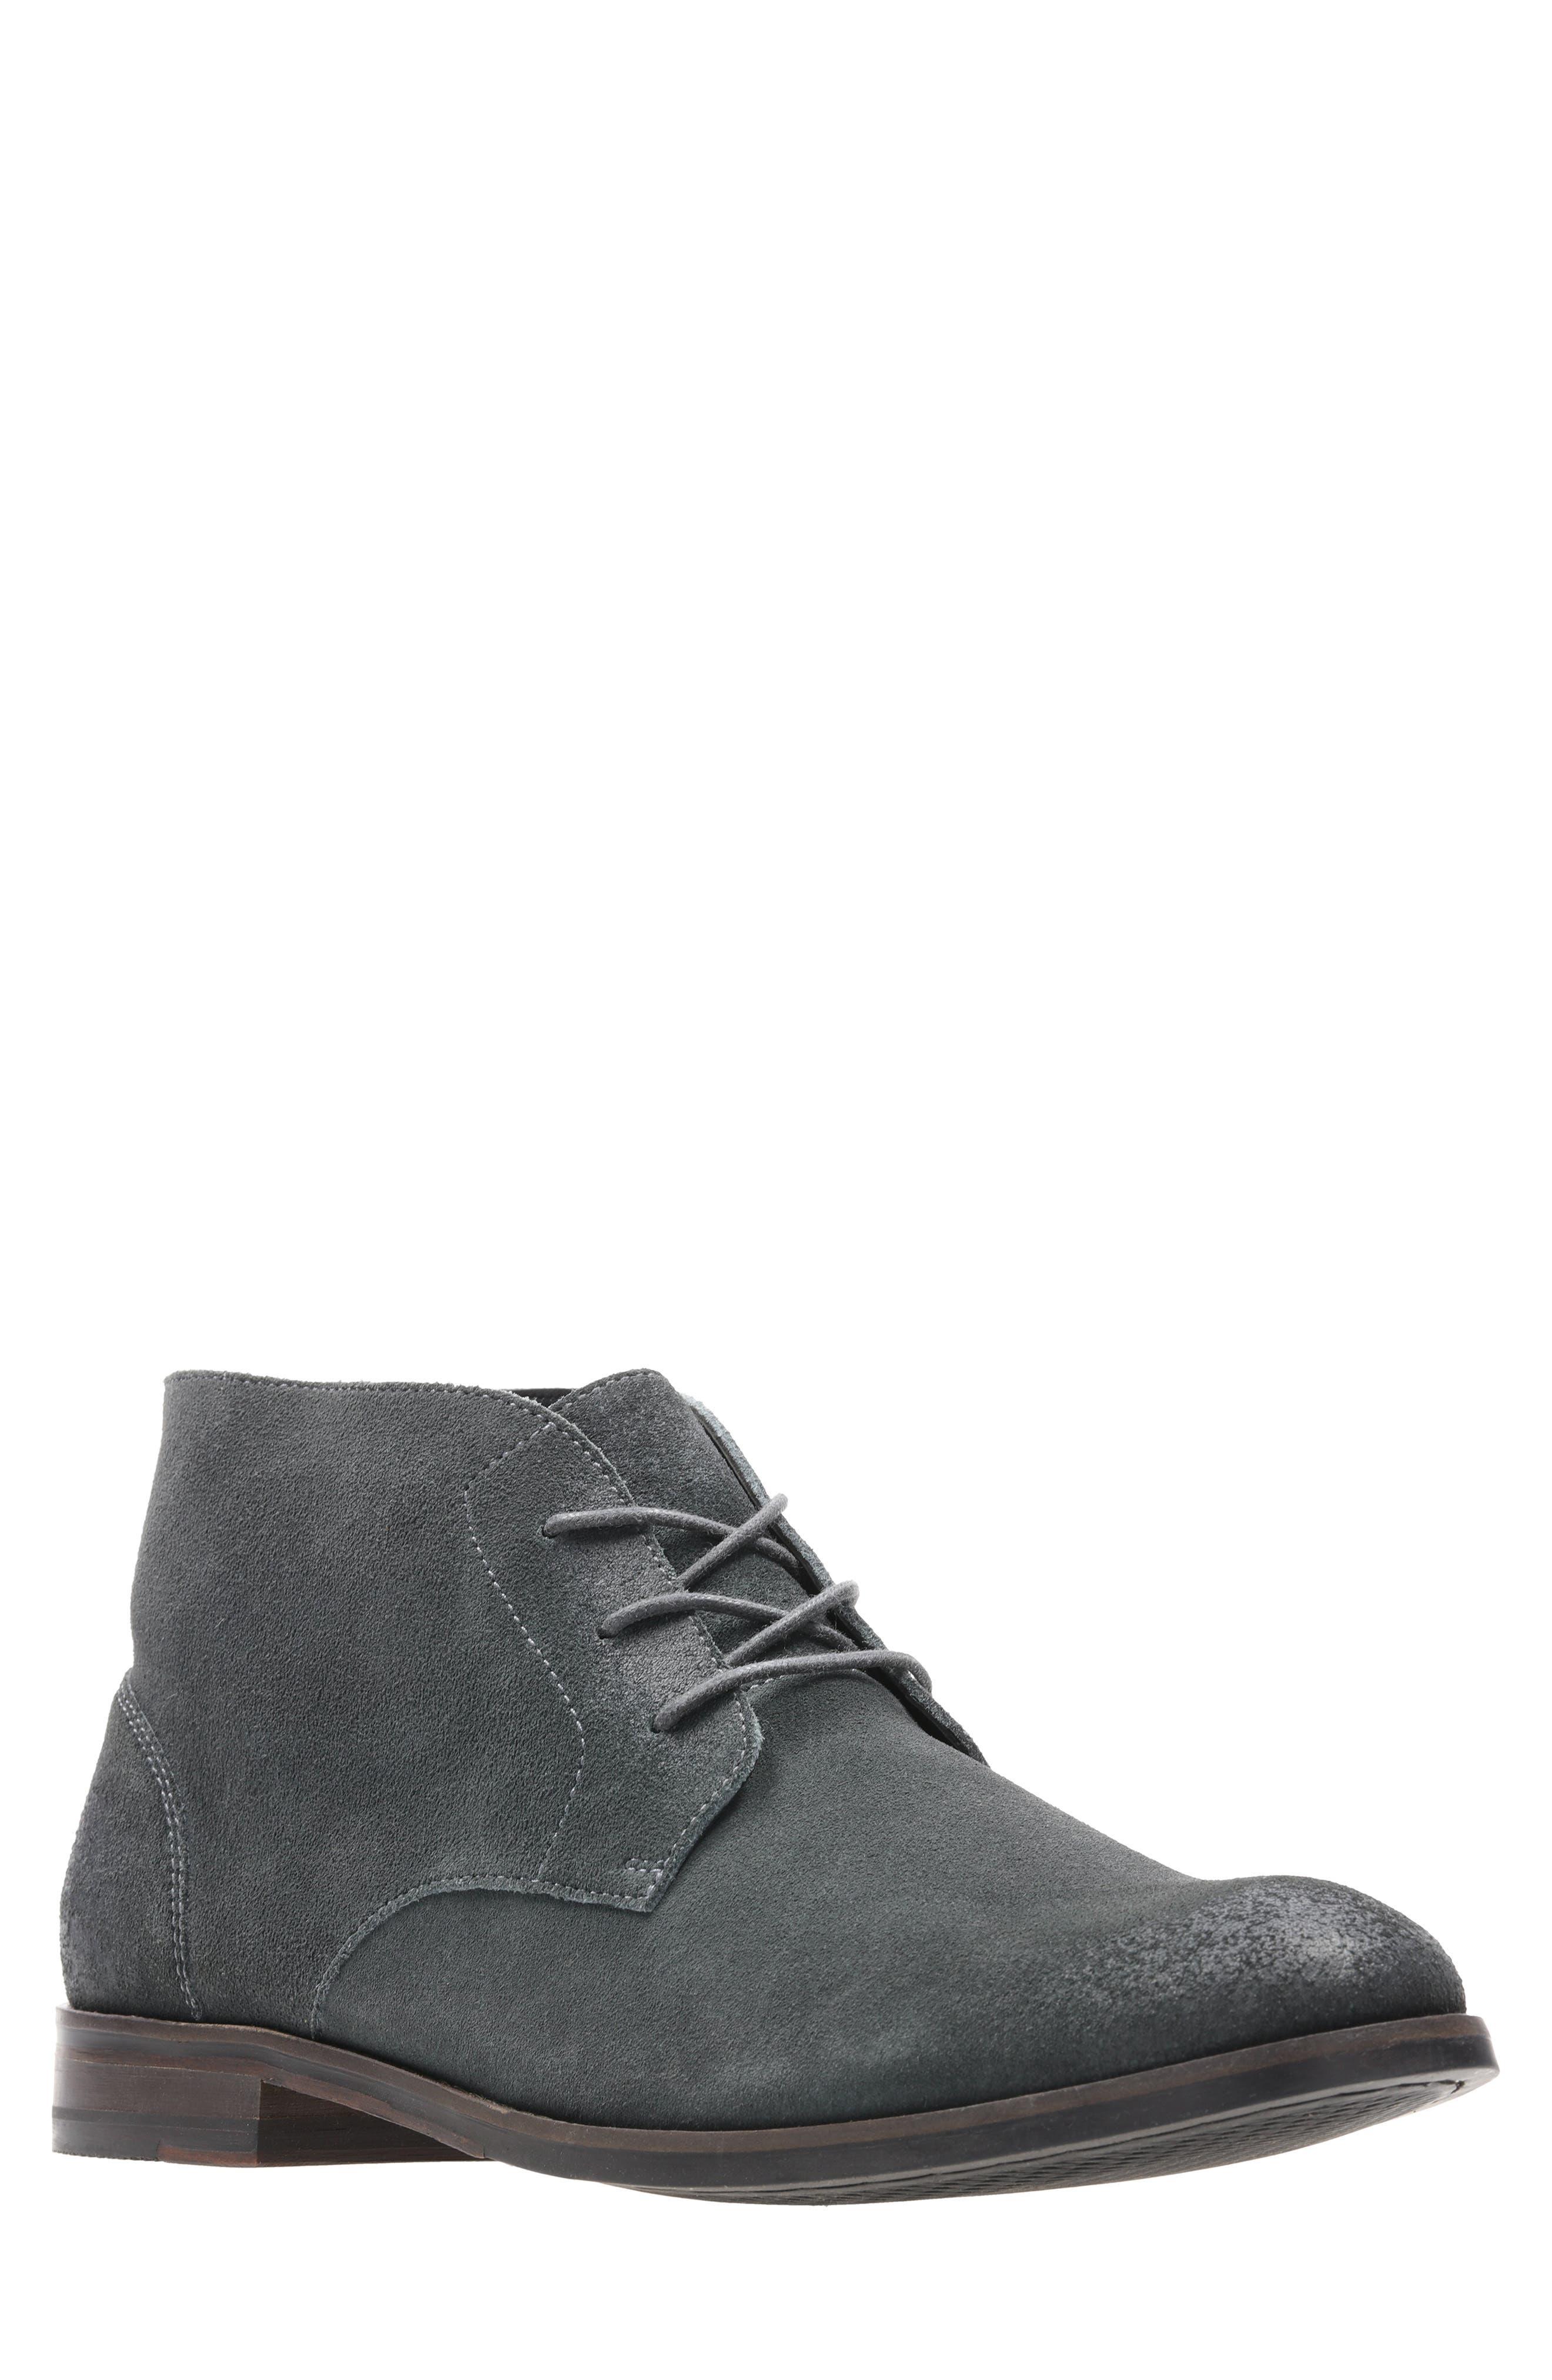 Clarks Flow Top Chukka Boot, Grey